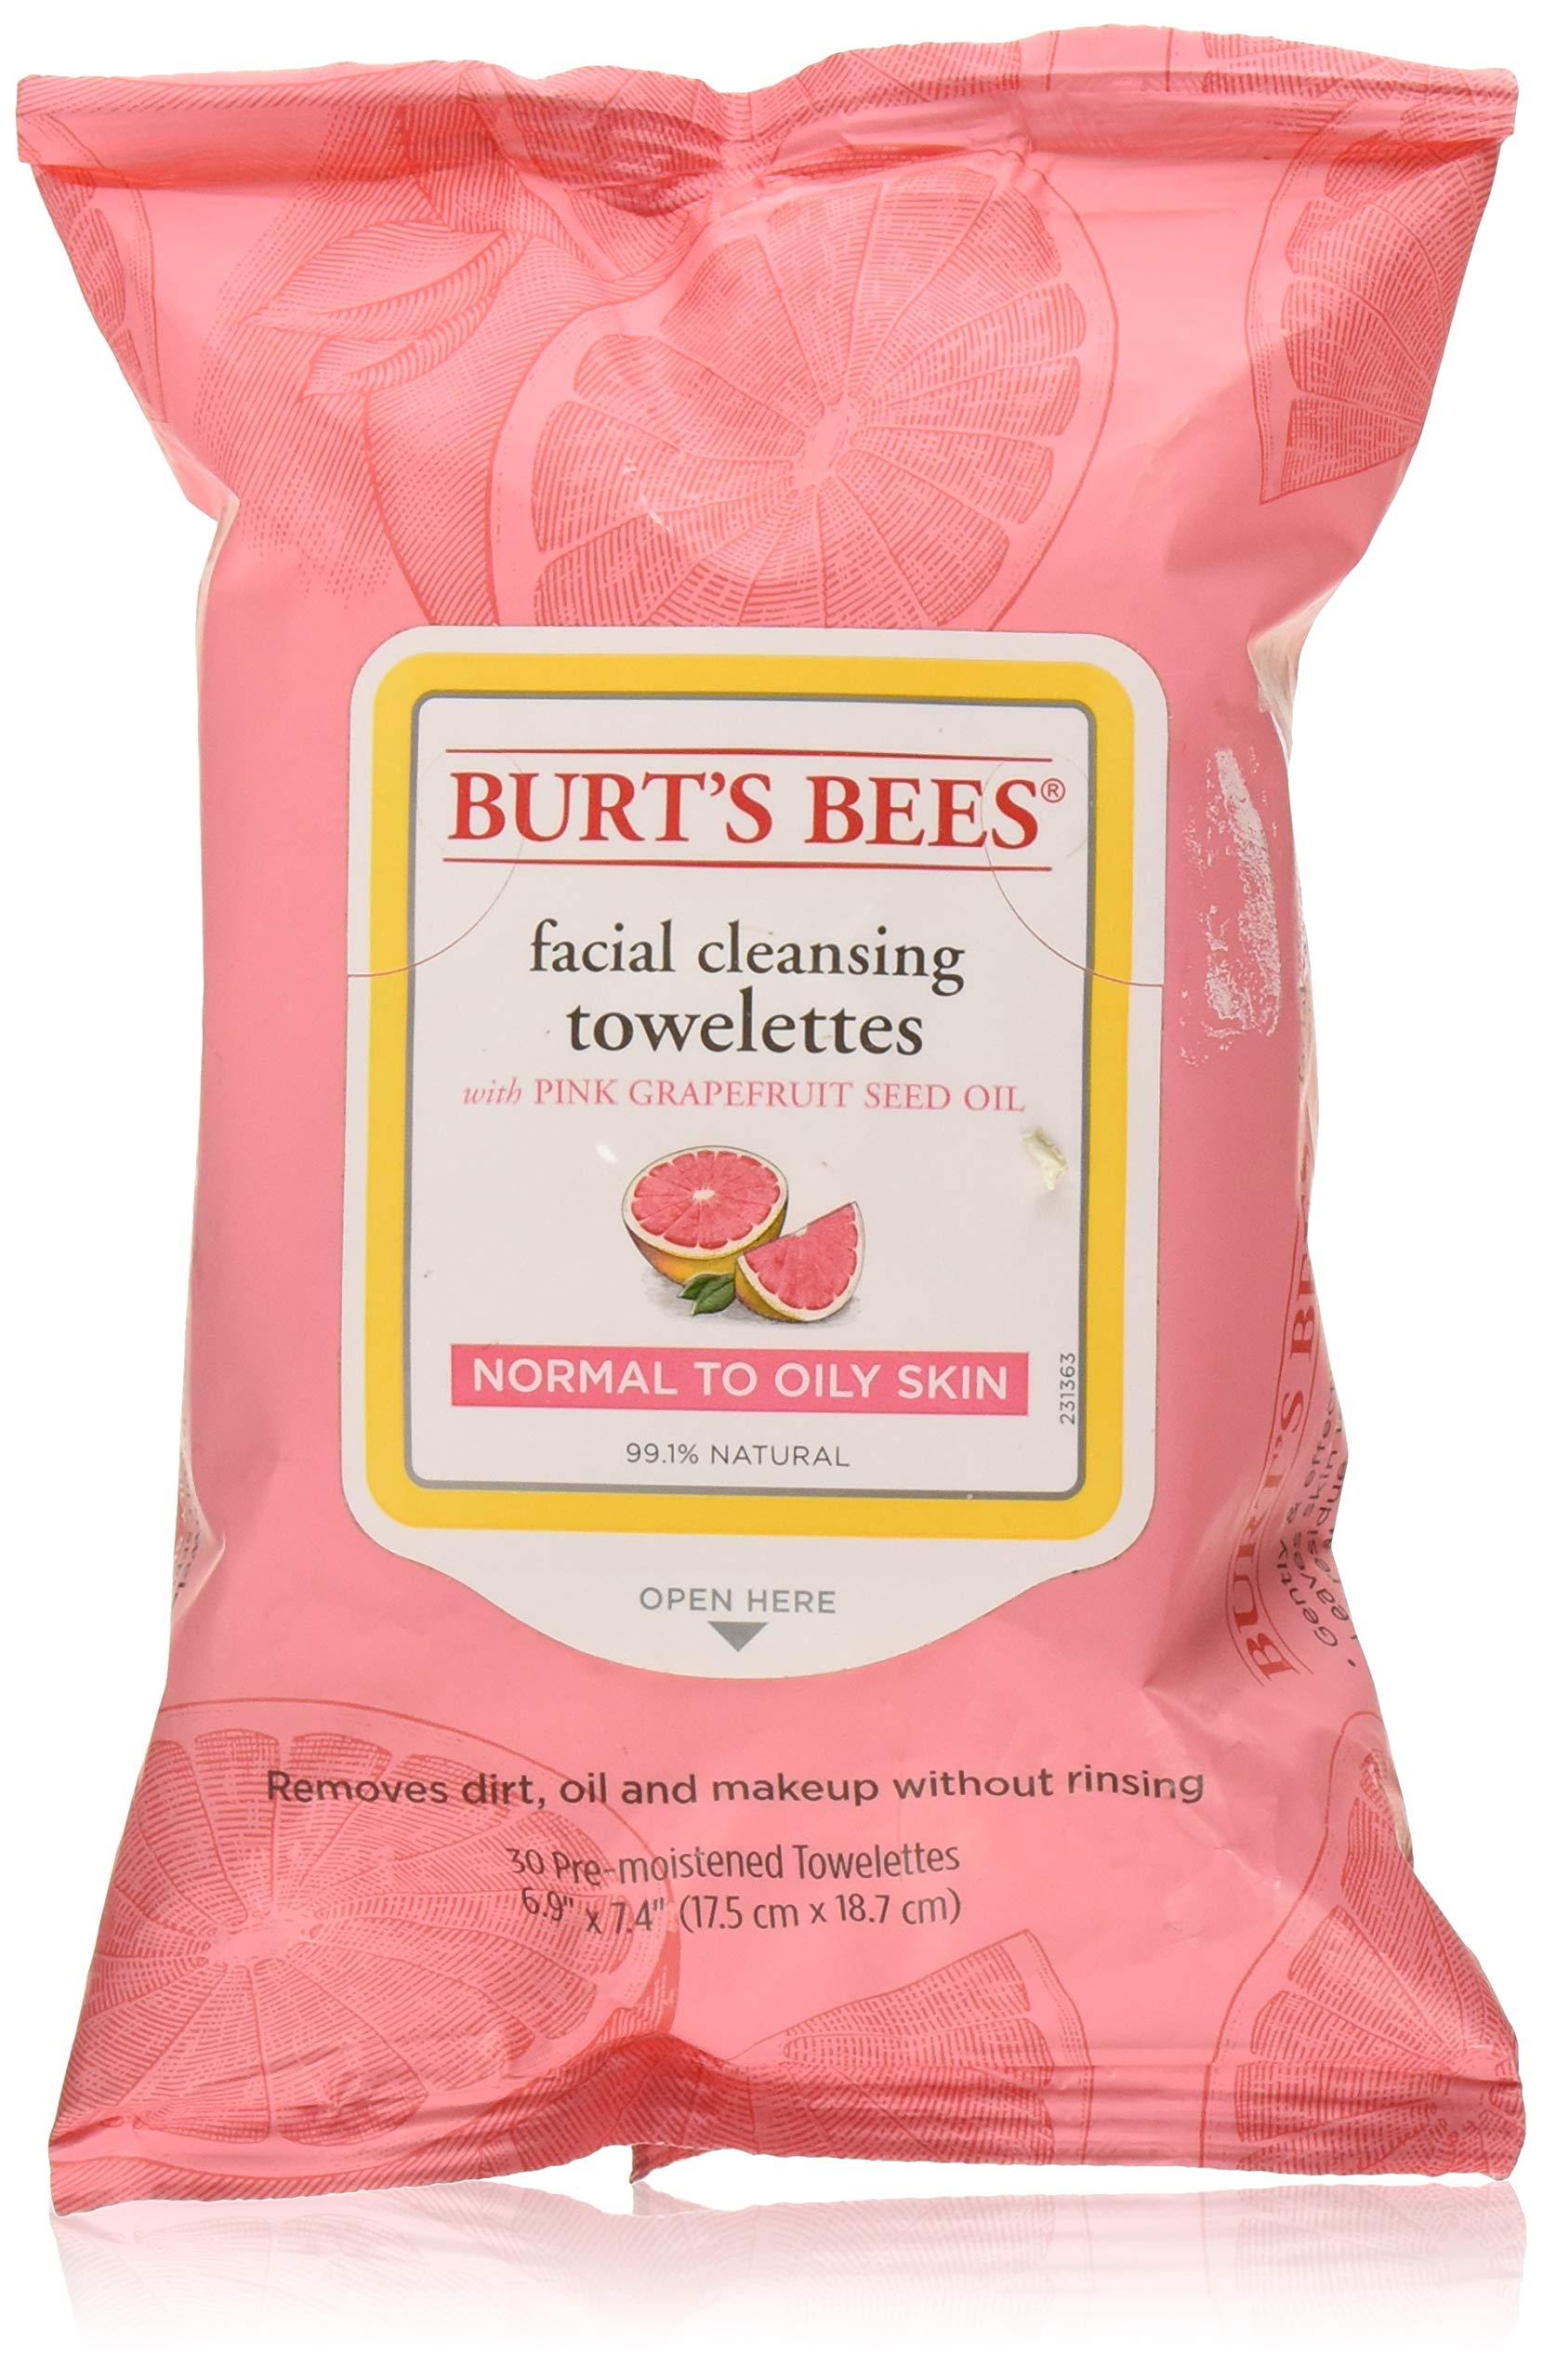 Burts Clnse Towelette Gra Size 30ct Burts Cleasing Towel Pink Grapefruit 30ct